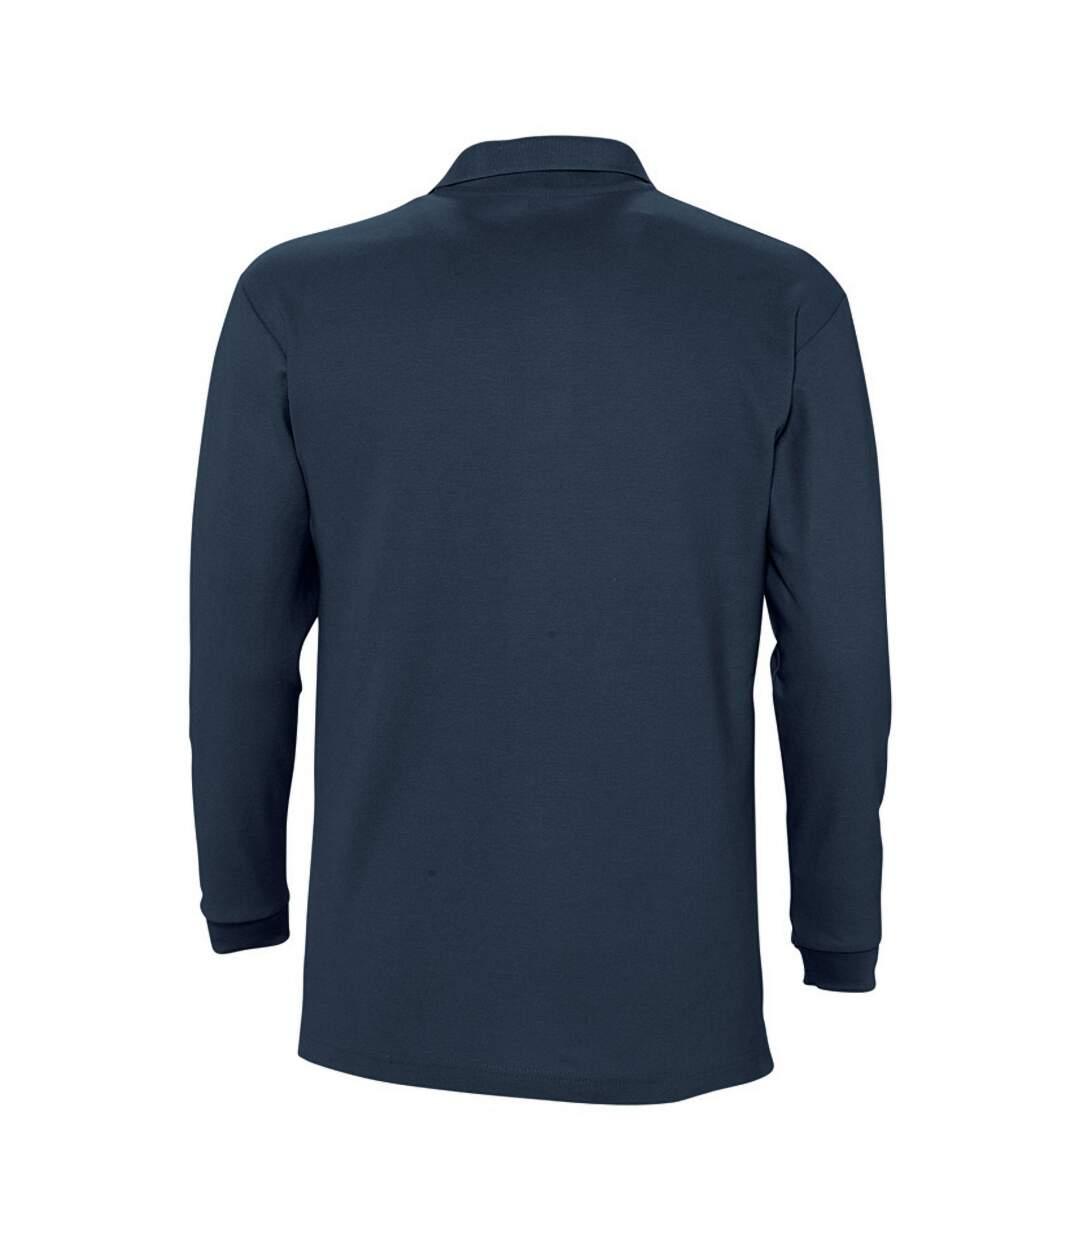 SOLS Mens Winter II Long Sleeve Pique Cotton Polo Shirt (Navy) - UTPC329